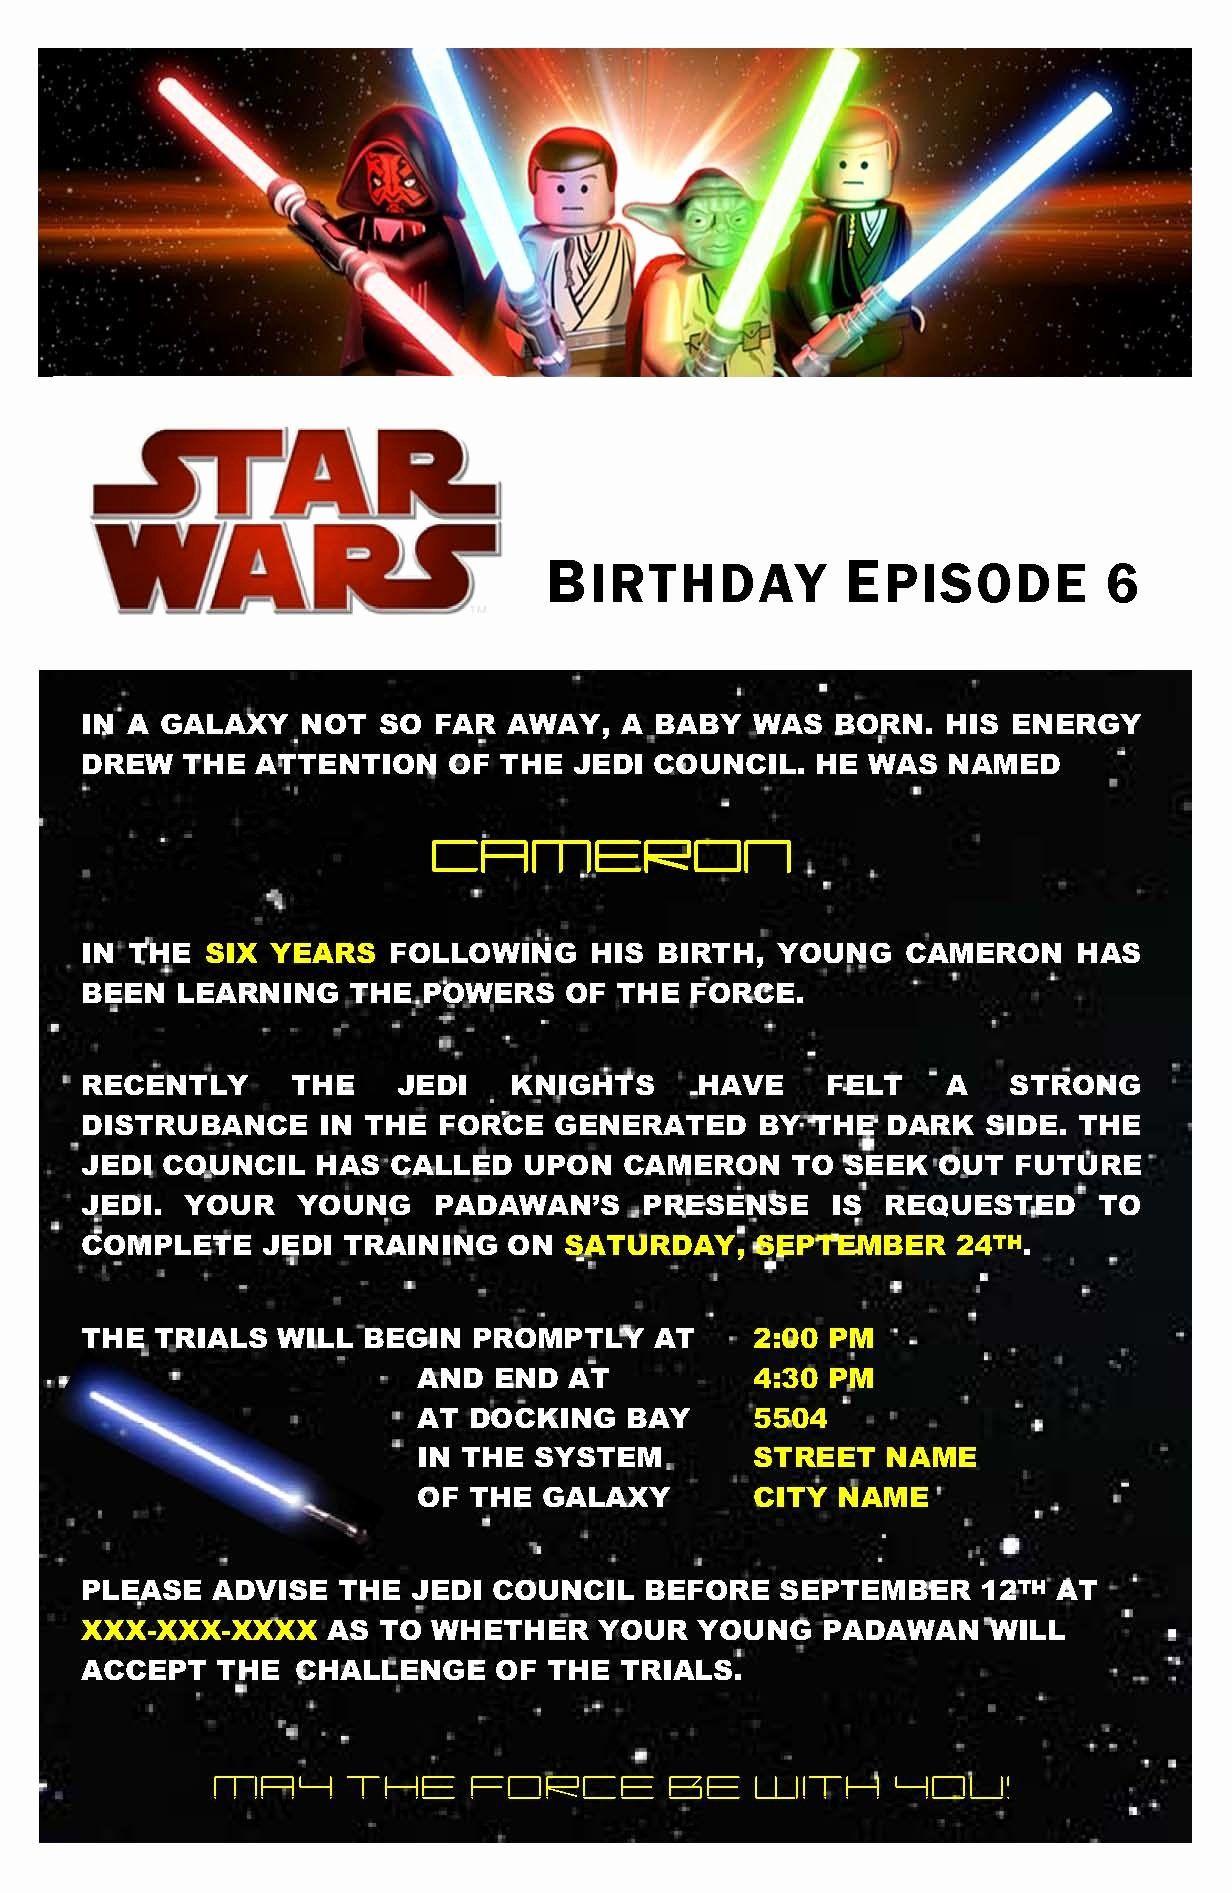 star wars birthday card template